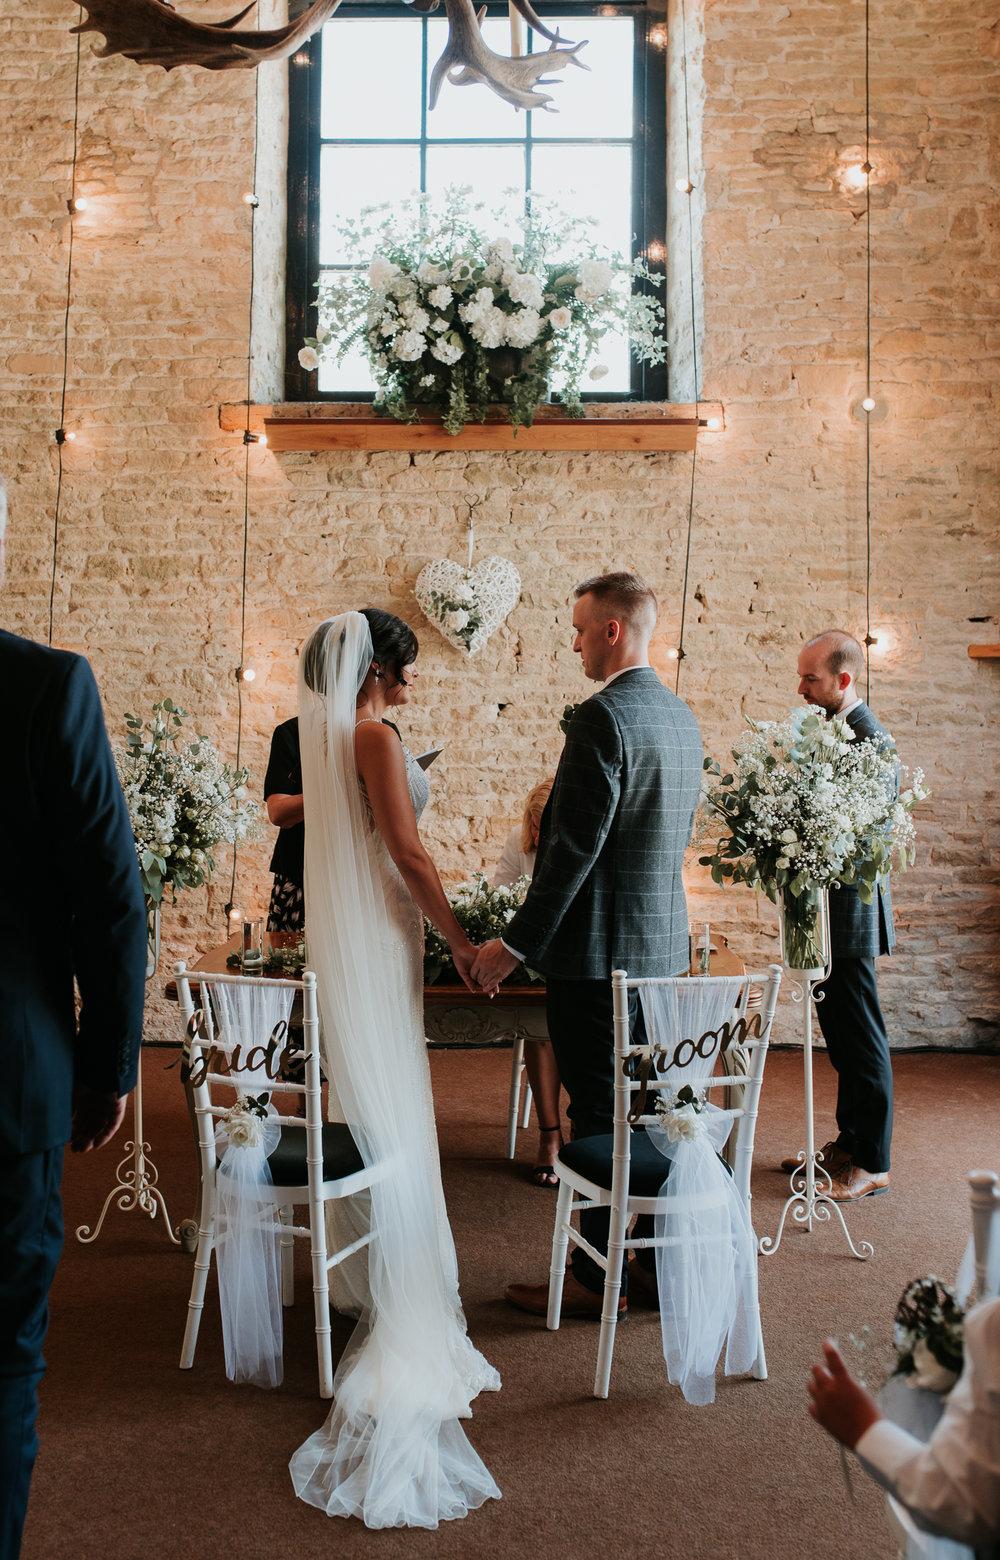 merriscourt wedding ceremony